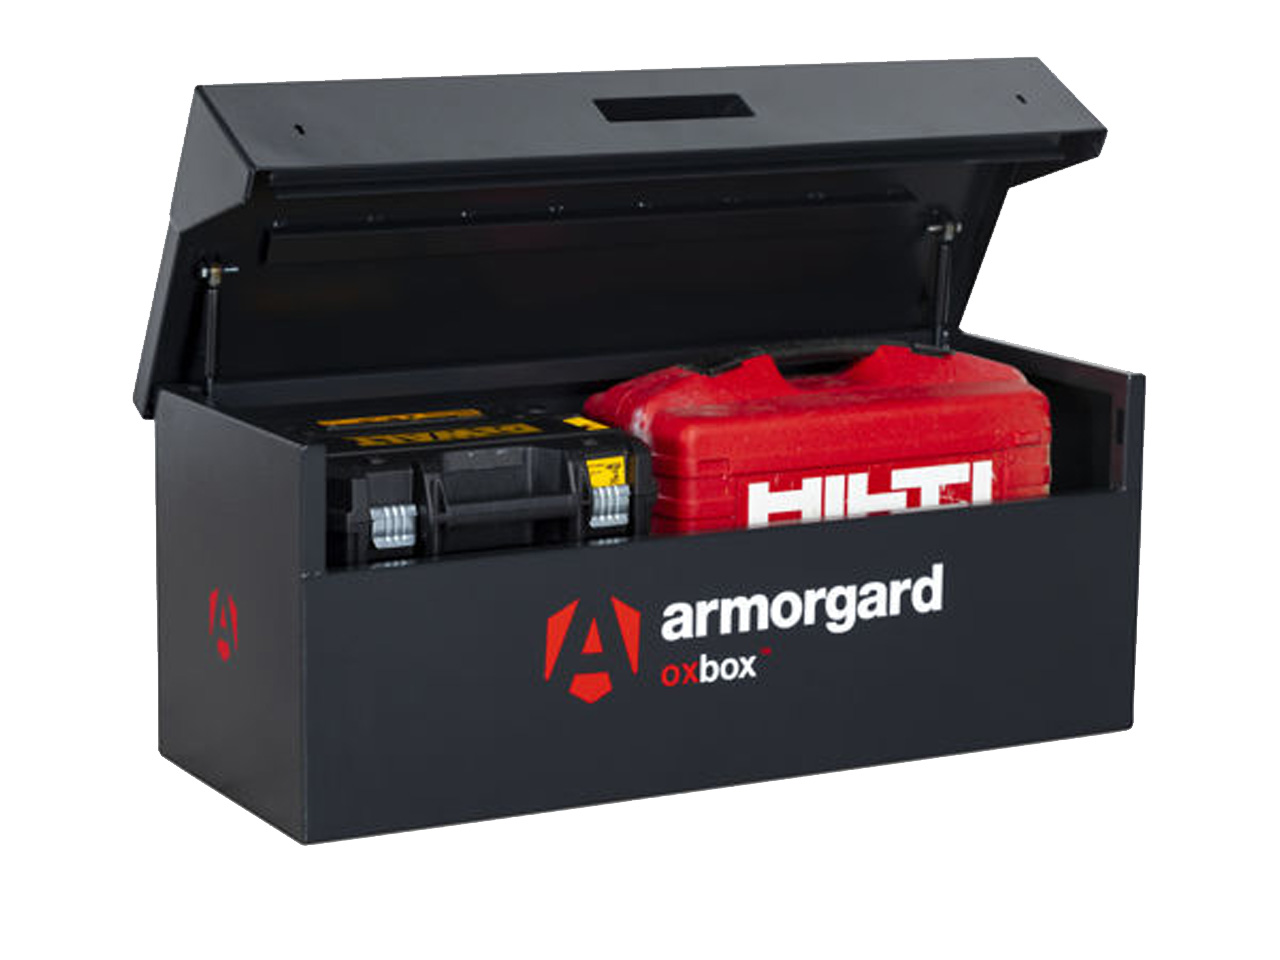 Armorgard_OX2v2.jpg